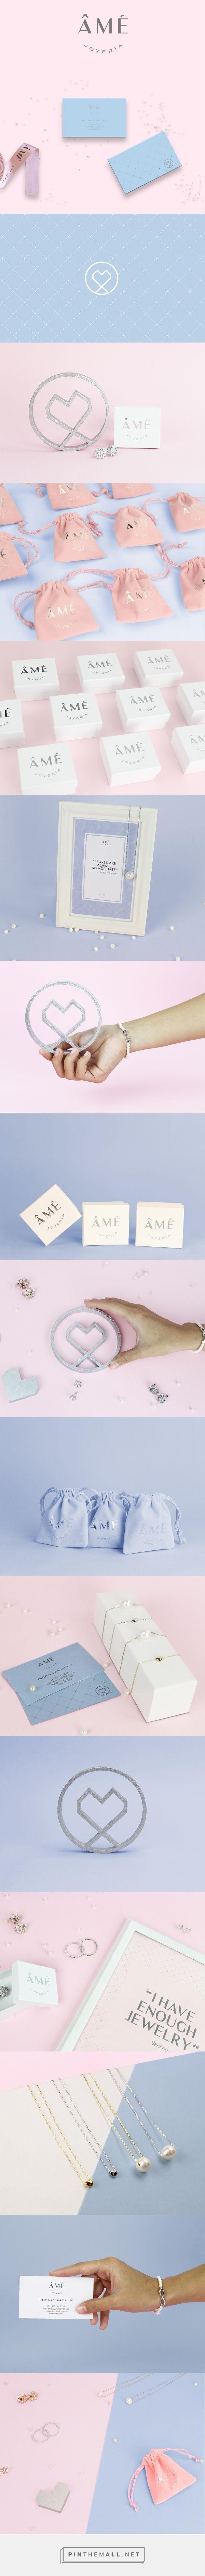 AME Joyeria Jewelry Branding and Packaging by Puro Diseno | Fivestar Branding – Design and Branding Agency & Inspiration Gallery | #BrandingInspiration